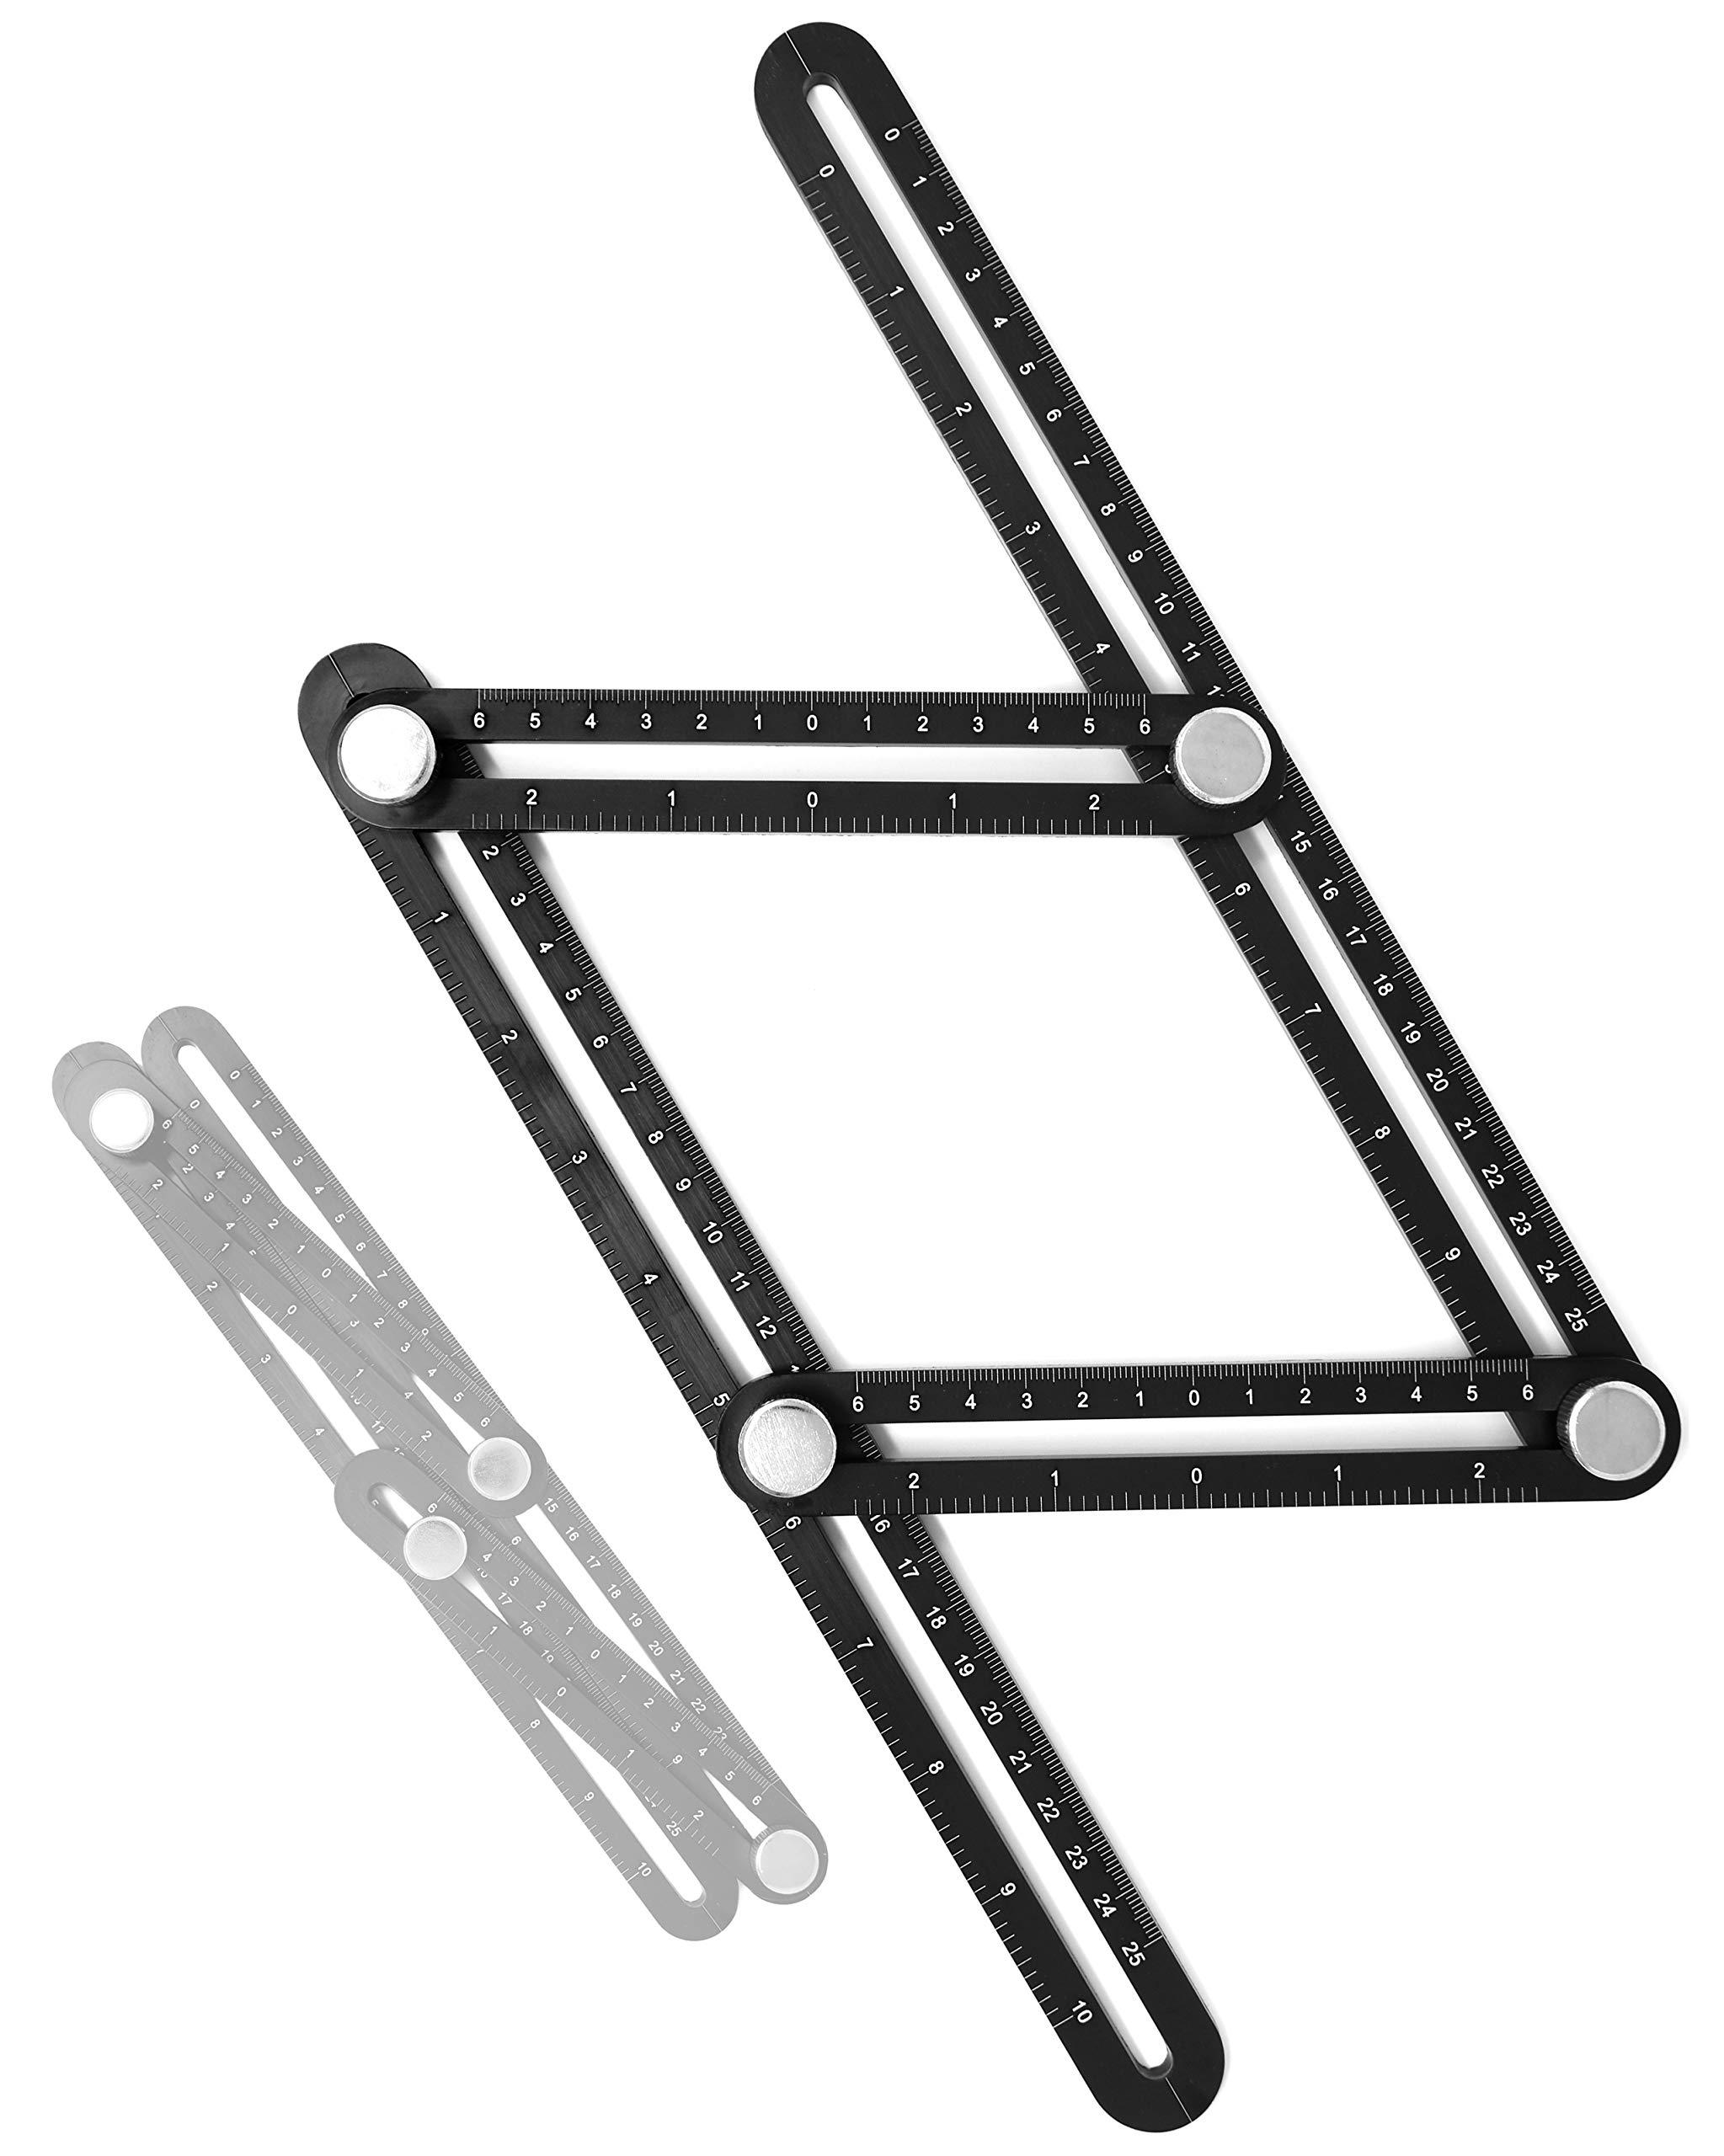 VViViD Black Heavy-Duty Multi-Angle Adjustable Four Holder Template Ruler by VViViD